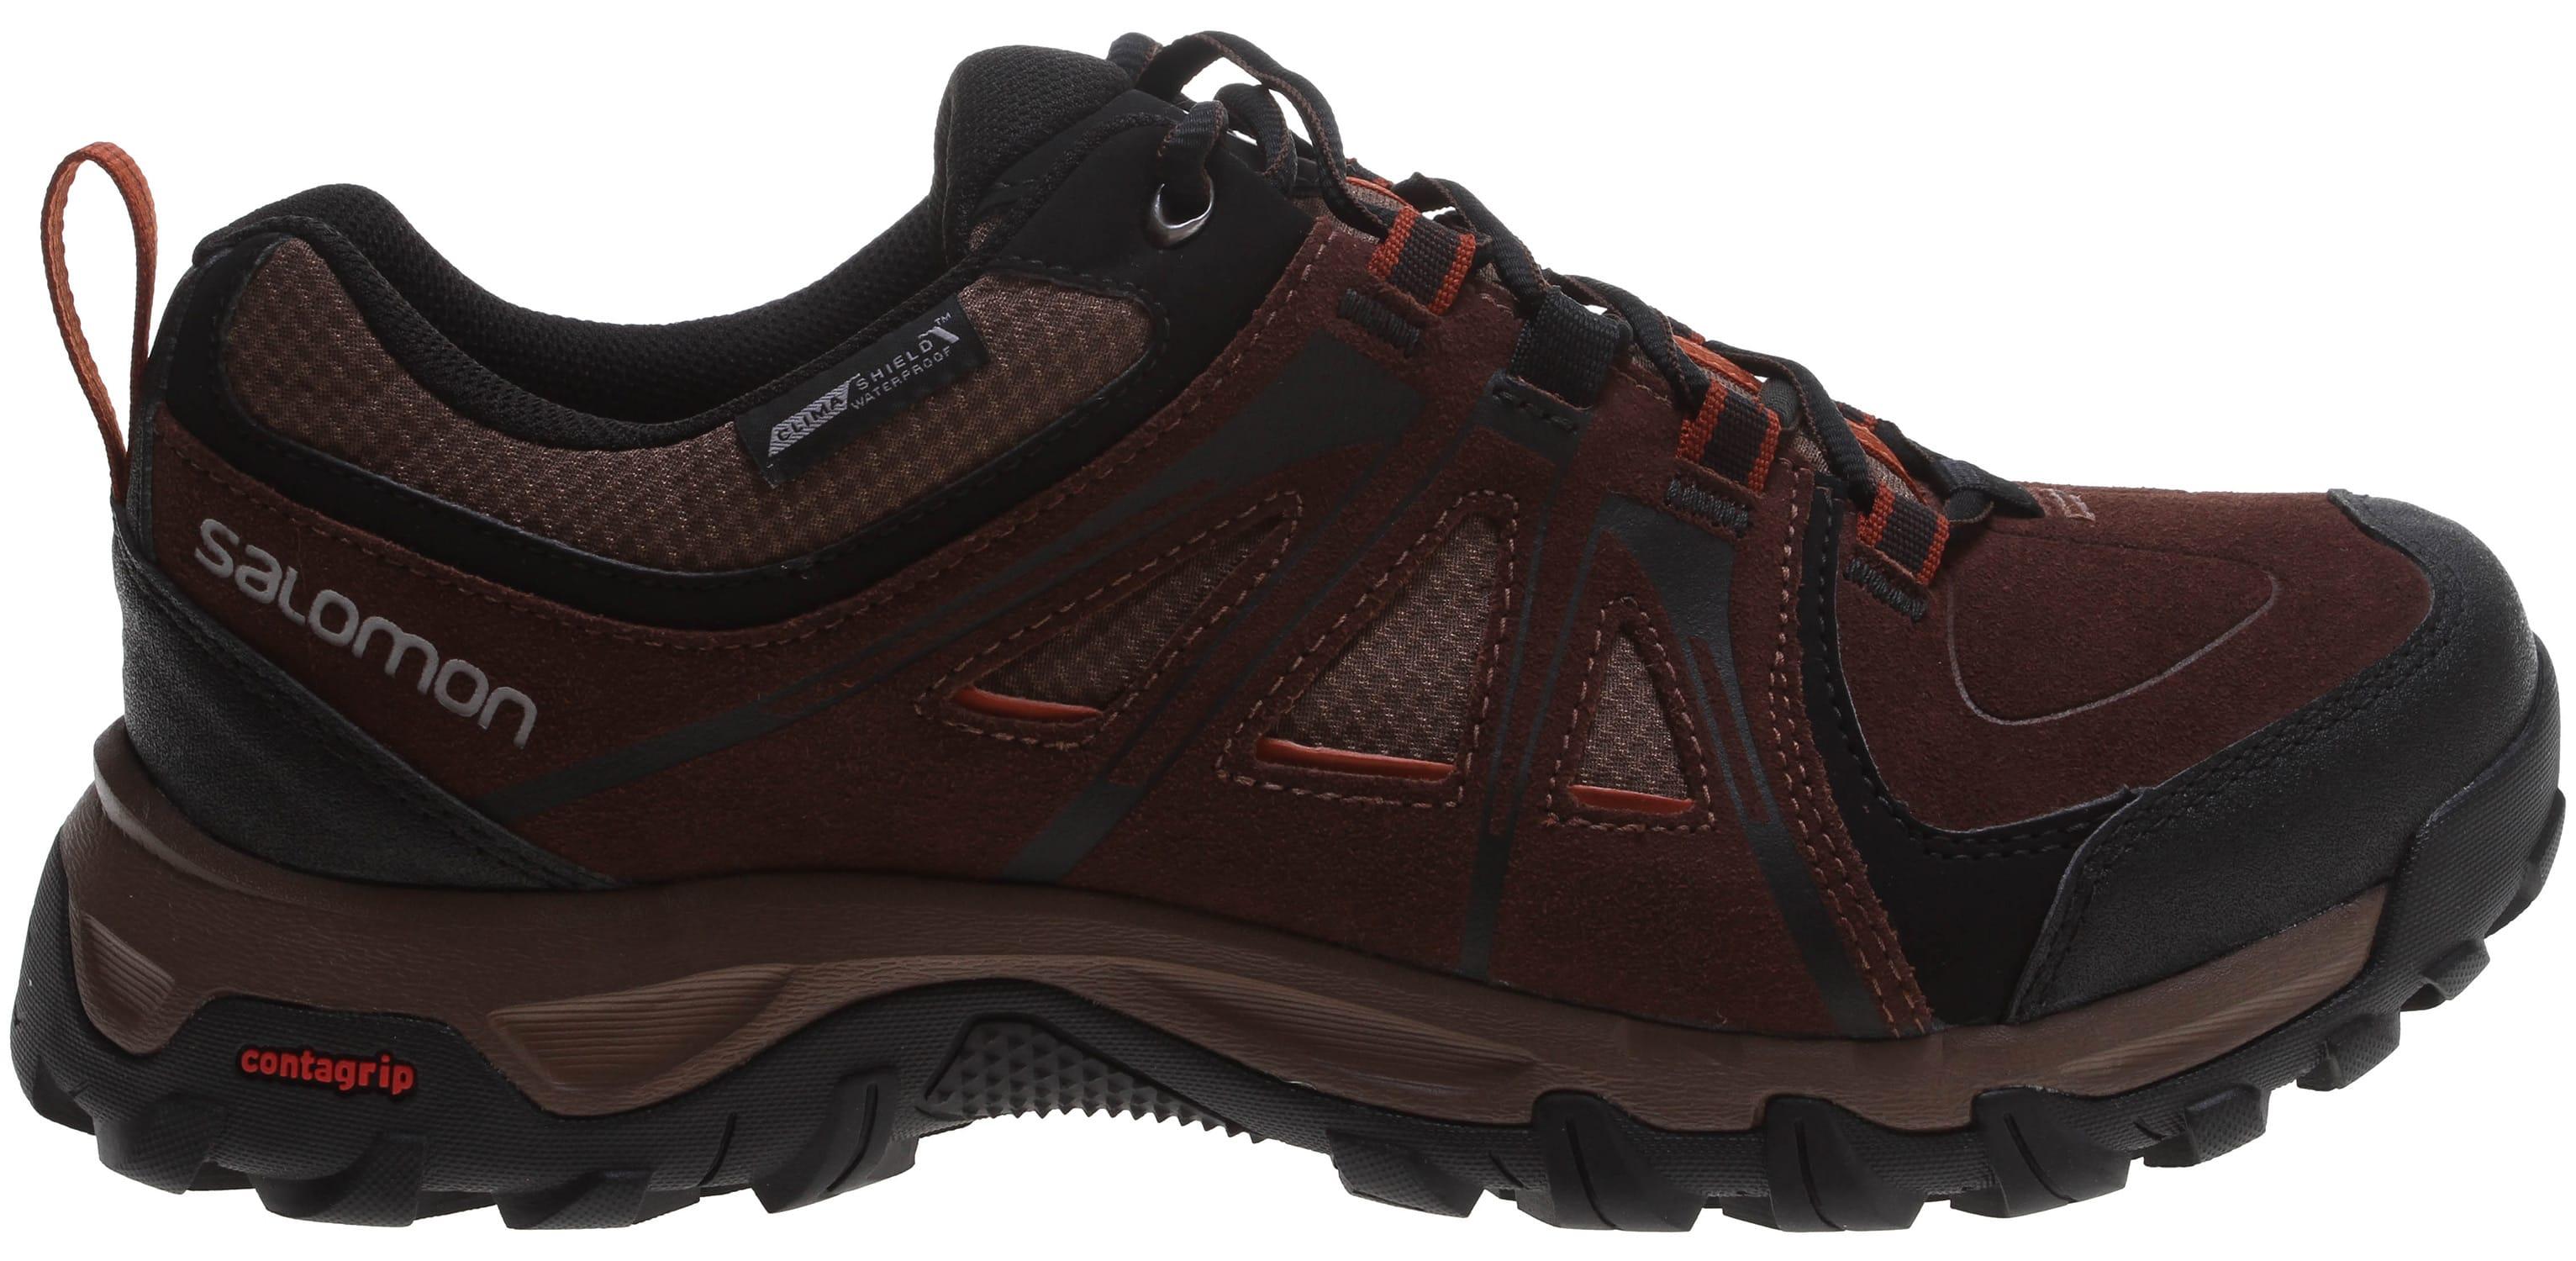 Water Resistant Men/'s EAN Hiking Shoes Salomon Evasion Cs Wp Leather